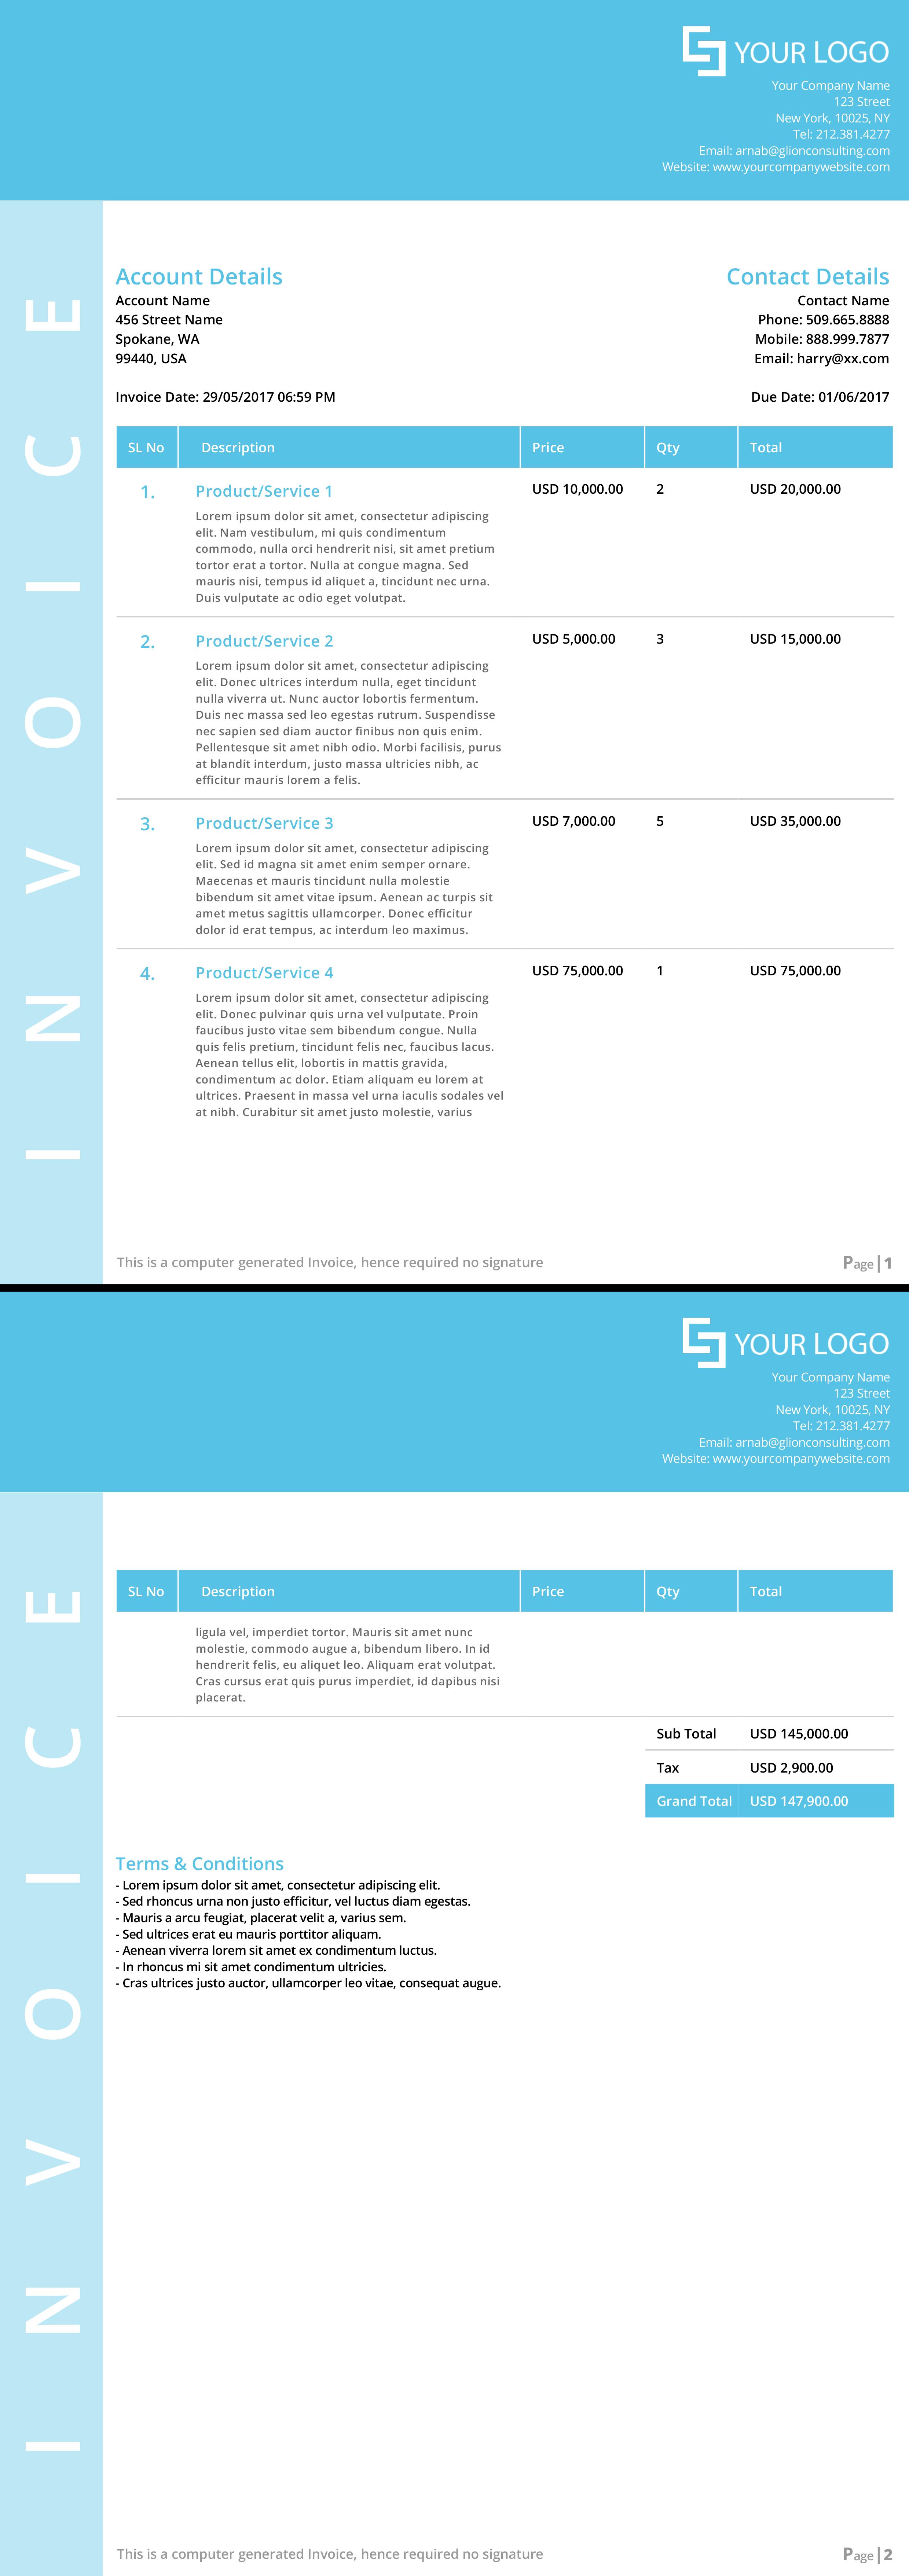 INV-ELEPHANT-BLUE-56C2E6-4.png